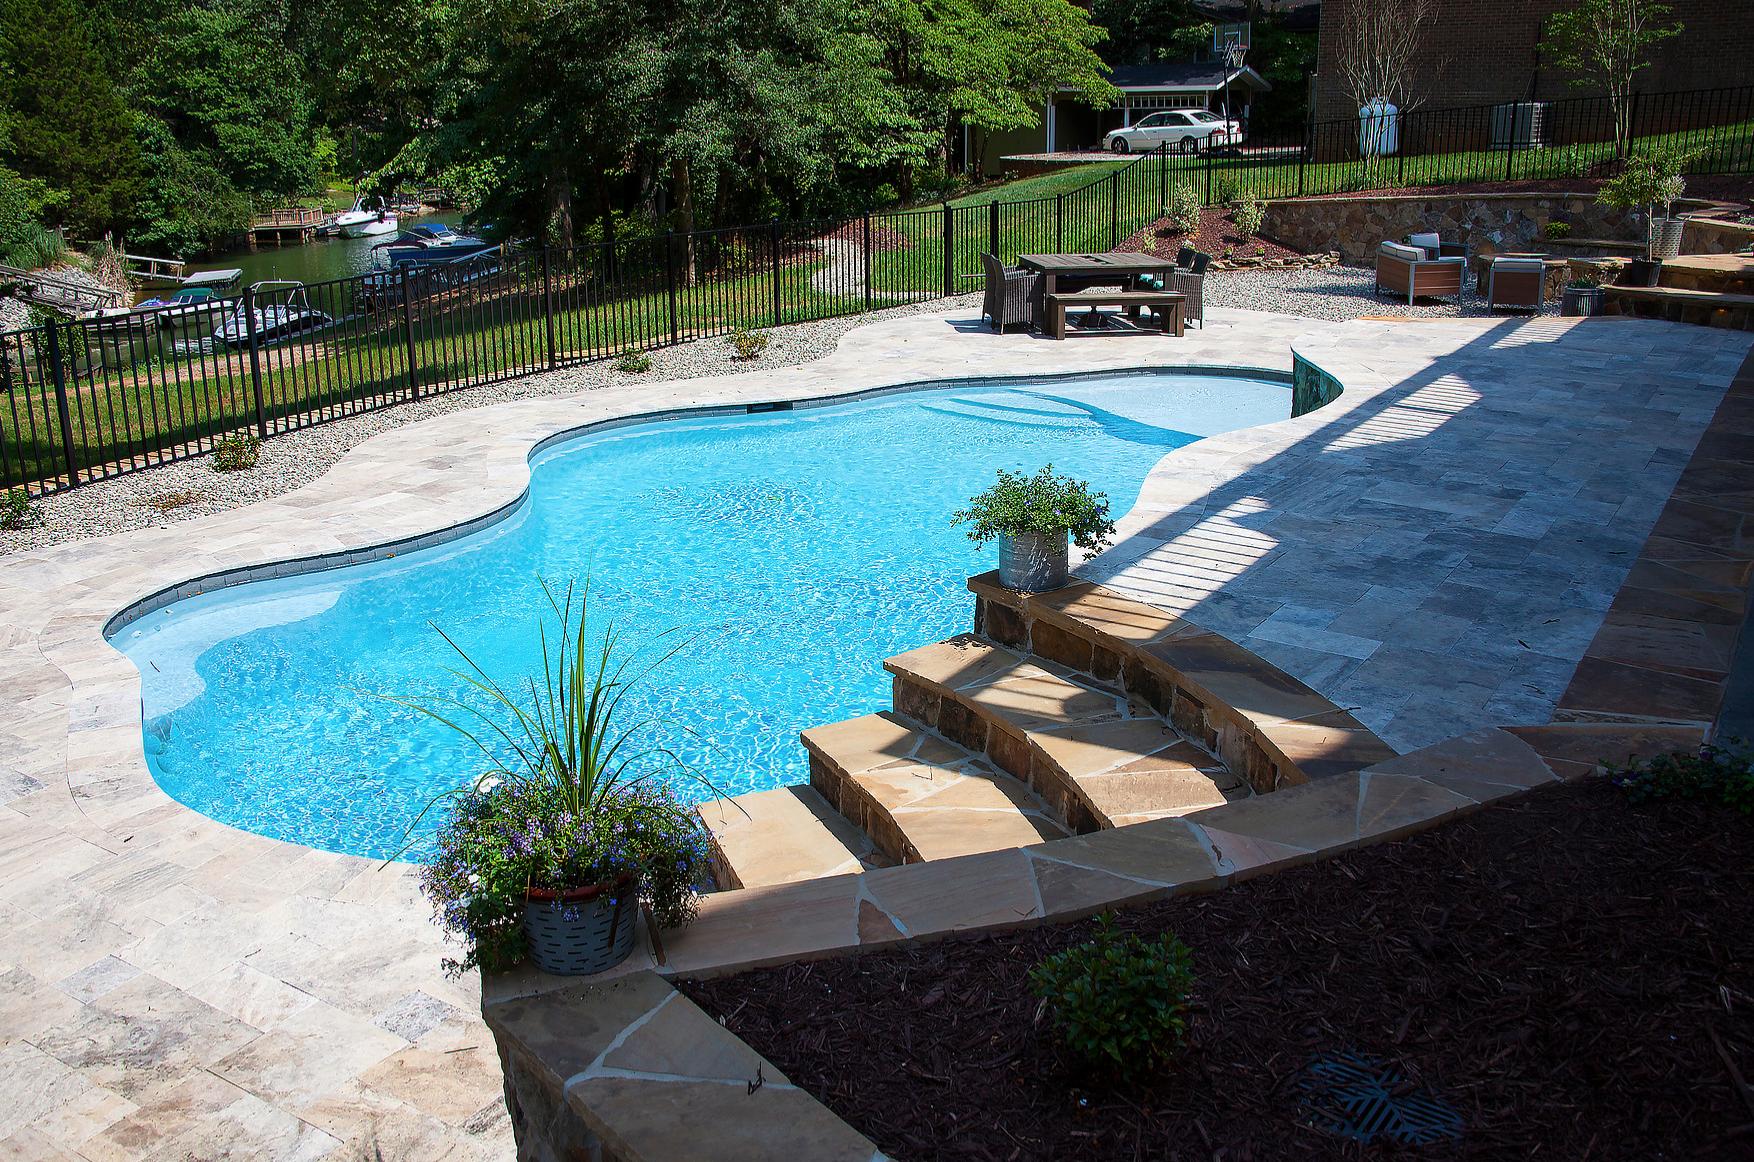 Custom Inground Concrete Pools Installed in Cornelius North Carolina with CPC Pools 704-799-5236